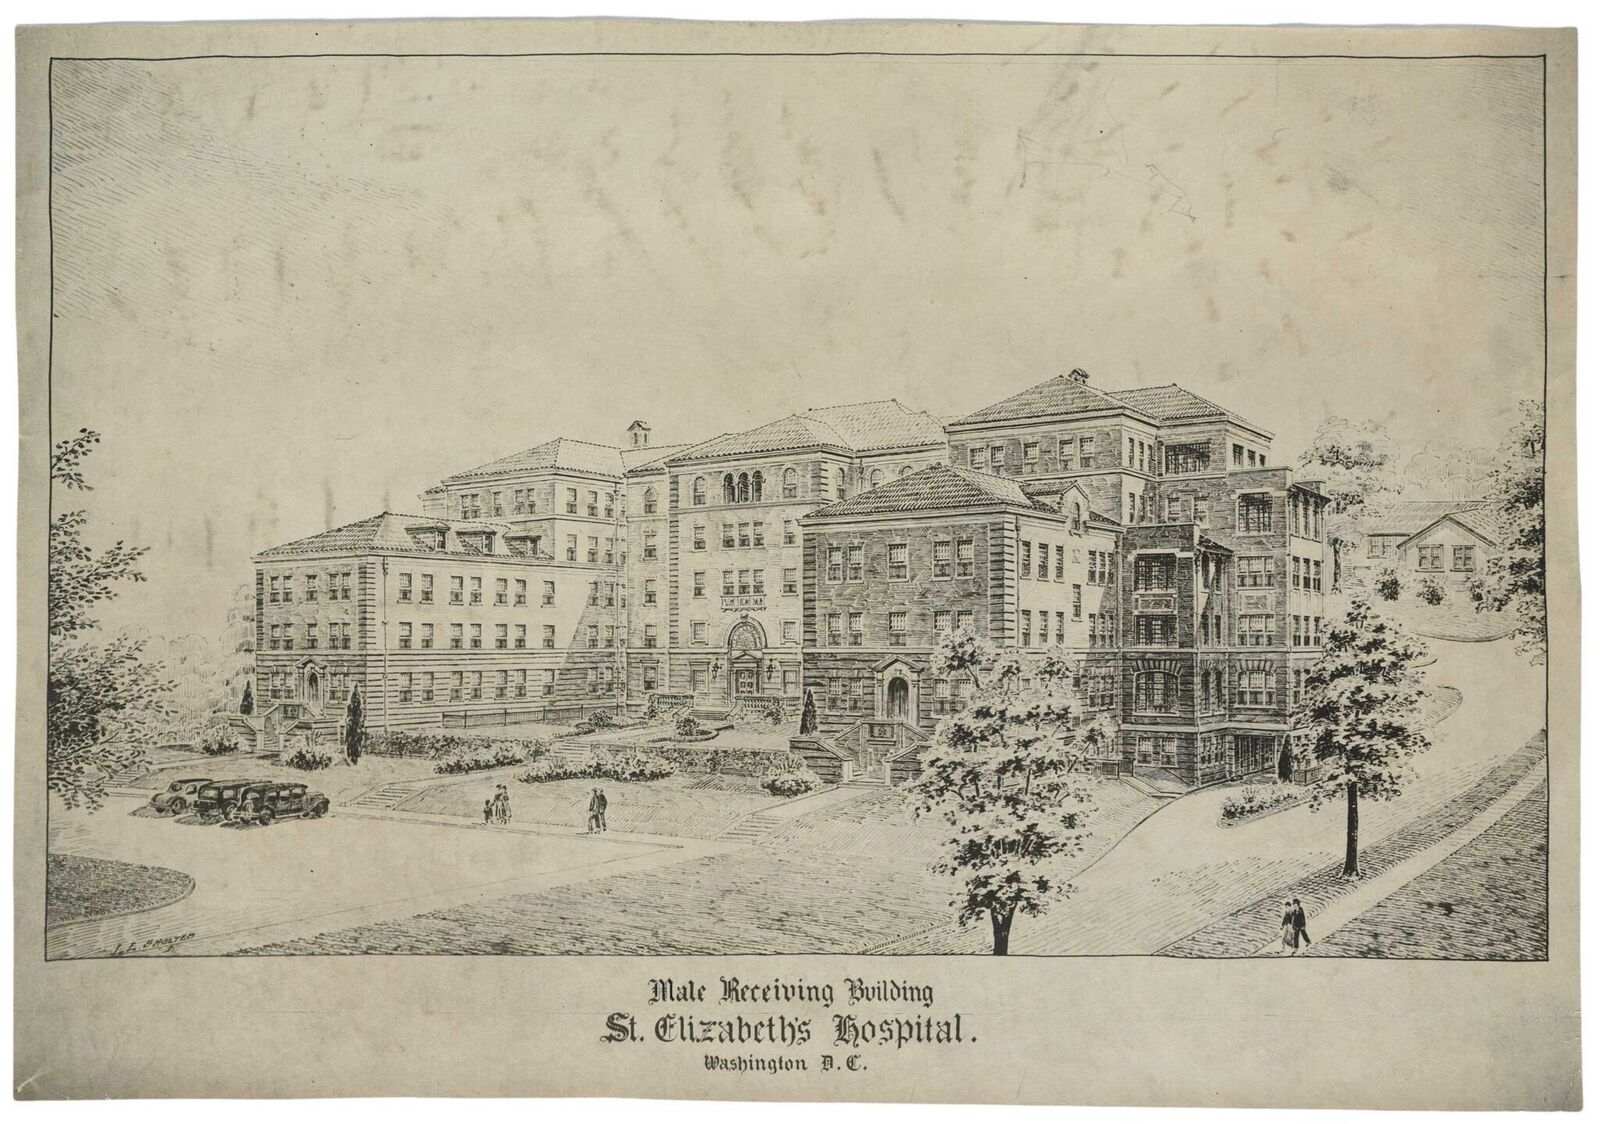 Saint Elizabeths Hospital